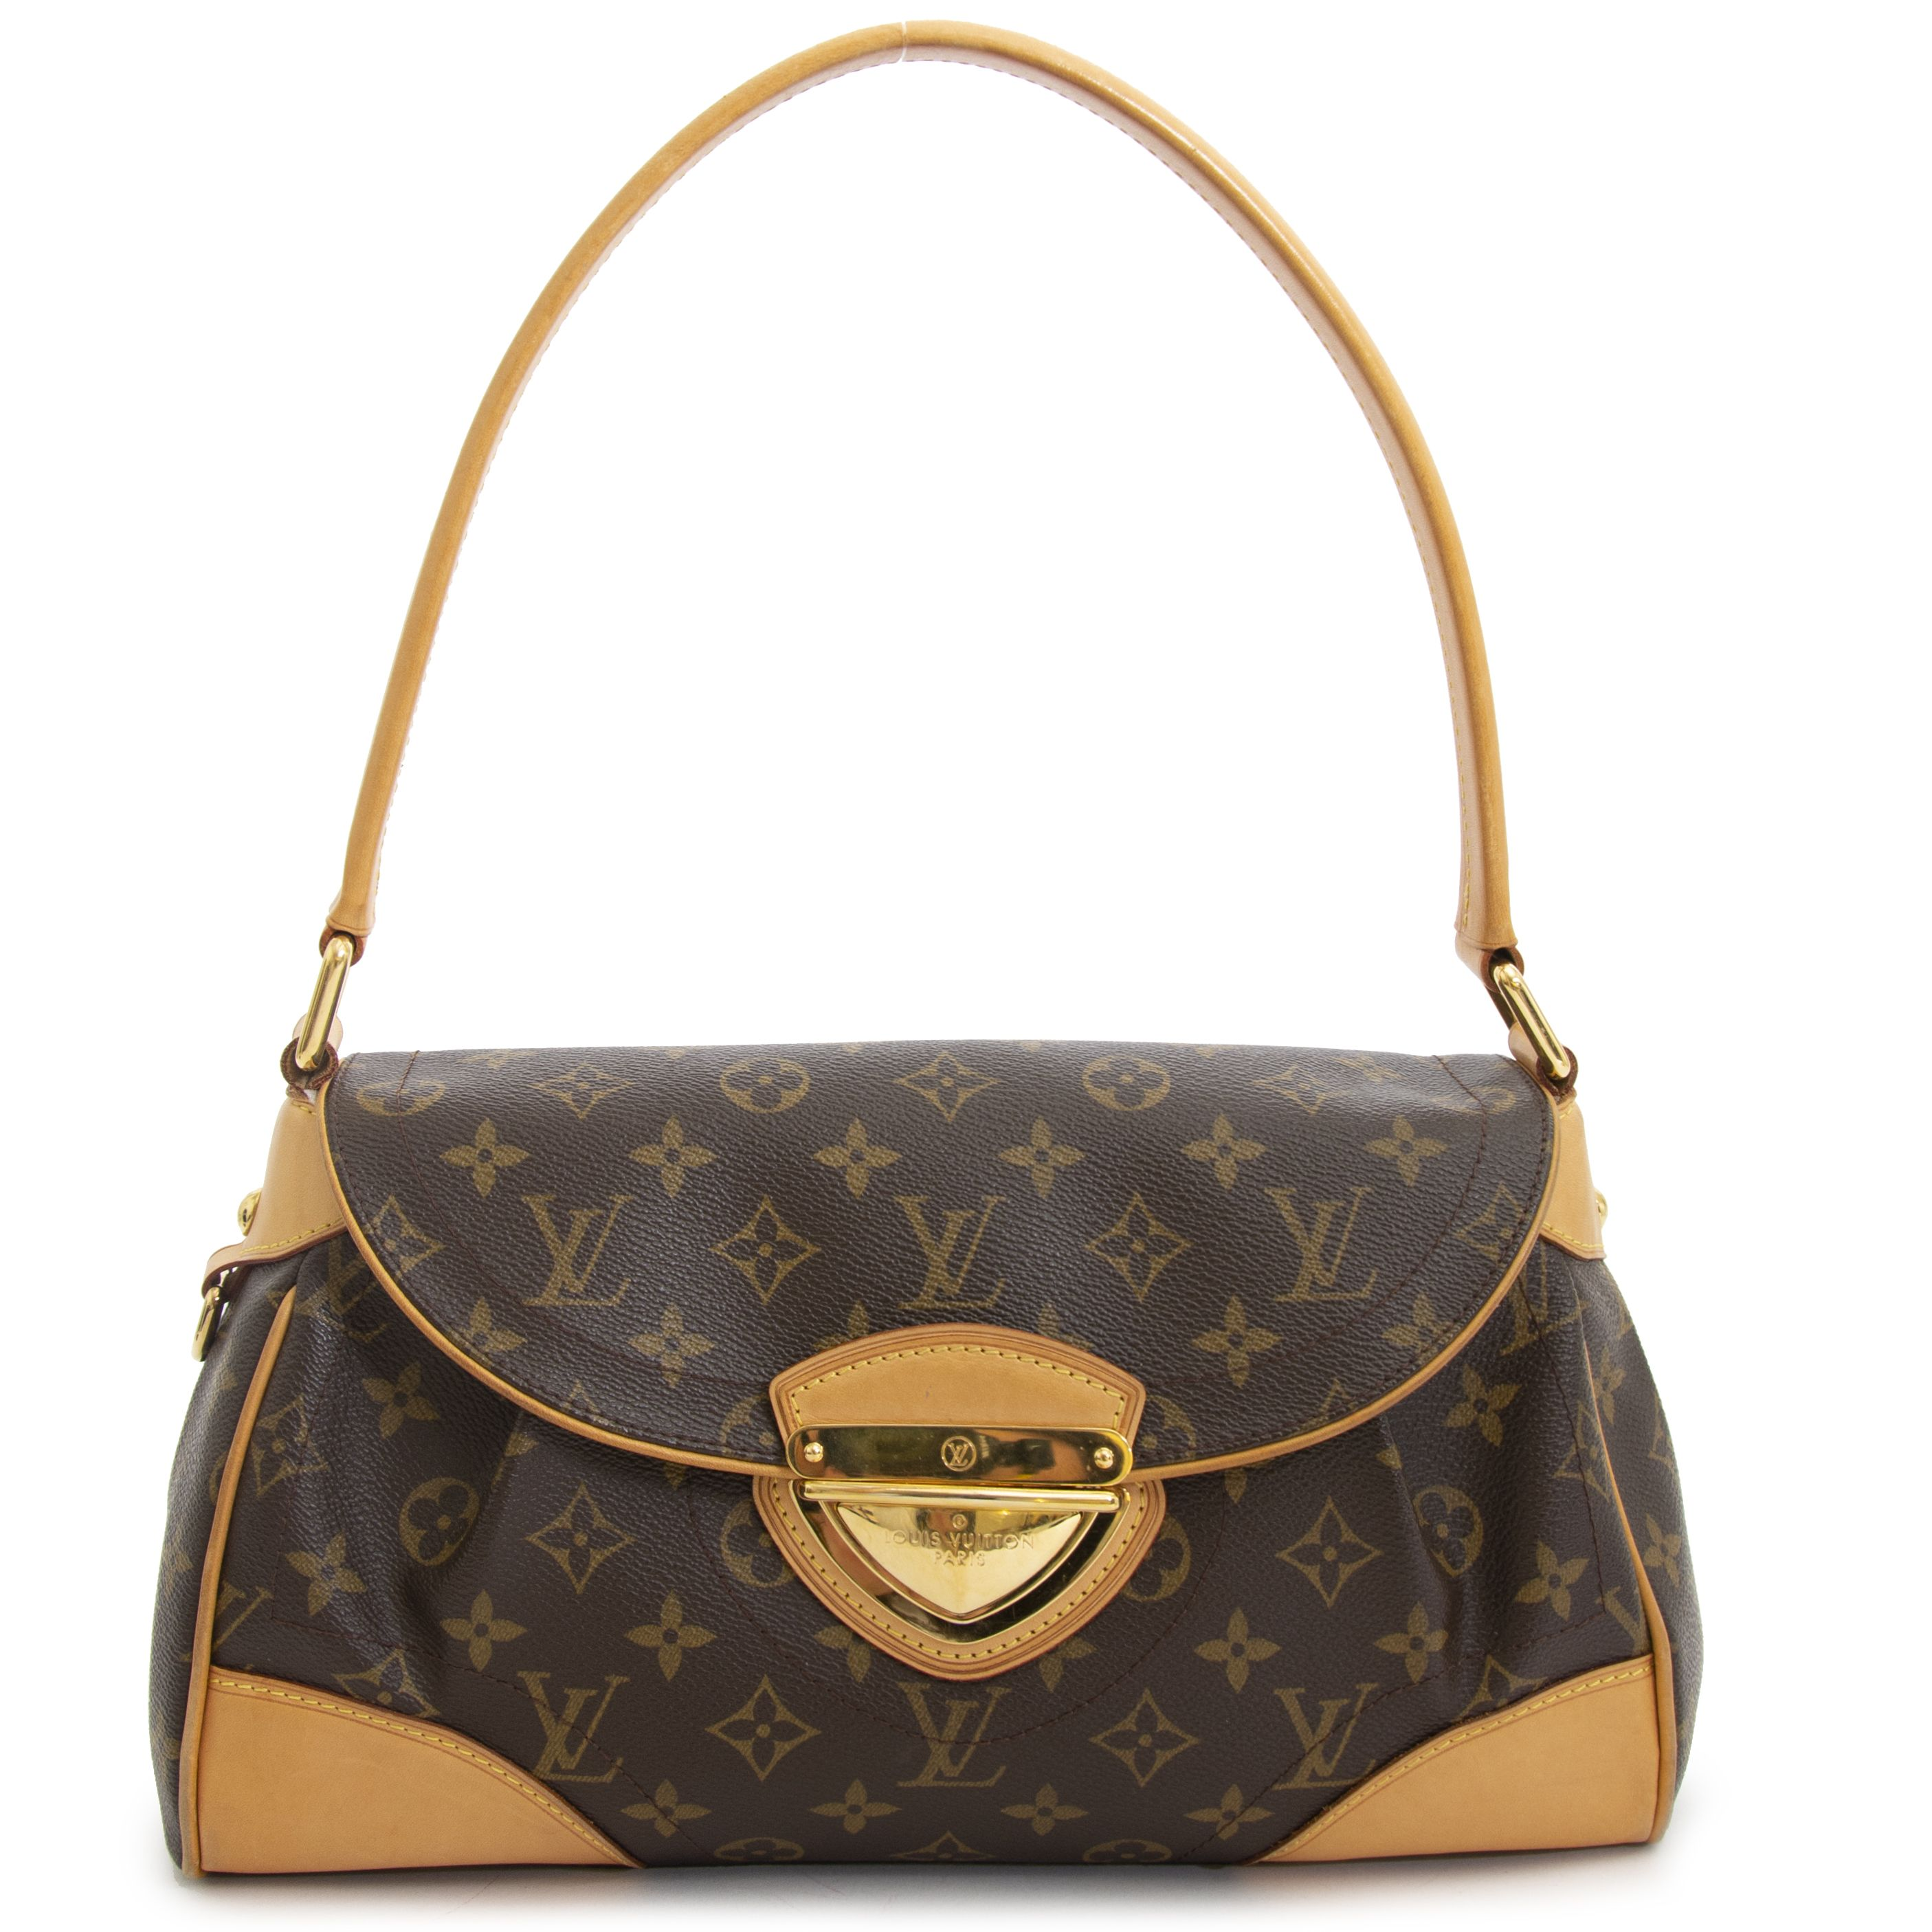 253831aaa497 Louis Vuitton Monogram Beverly MM